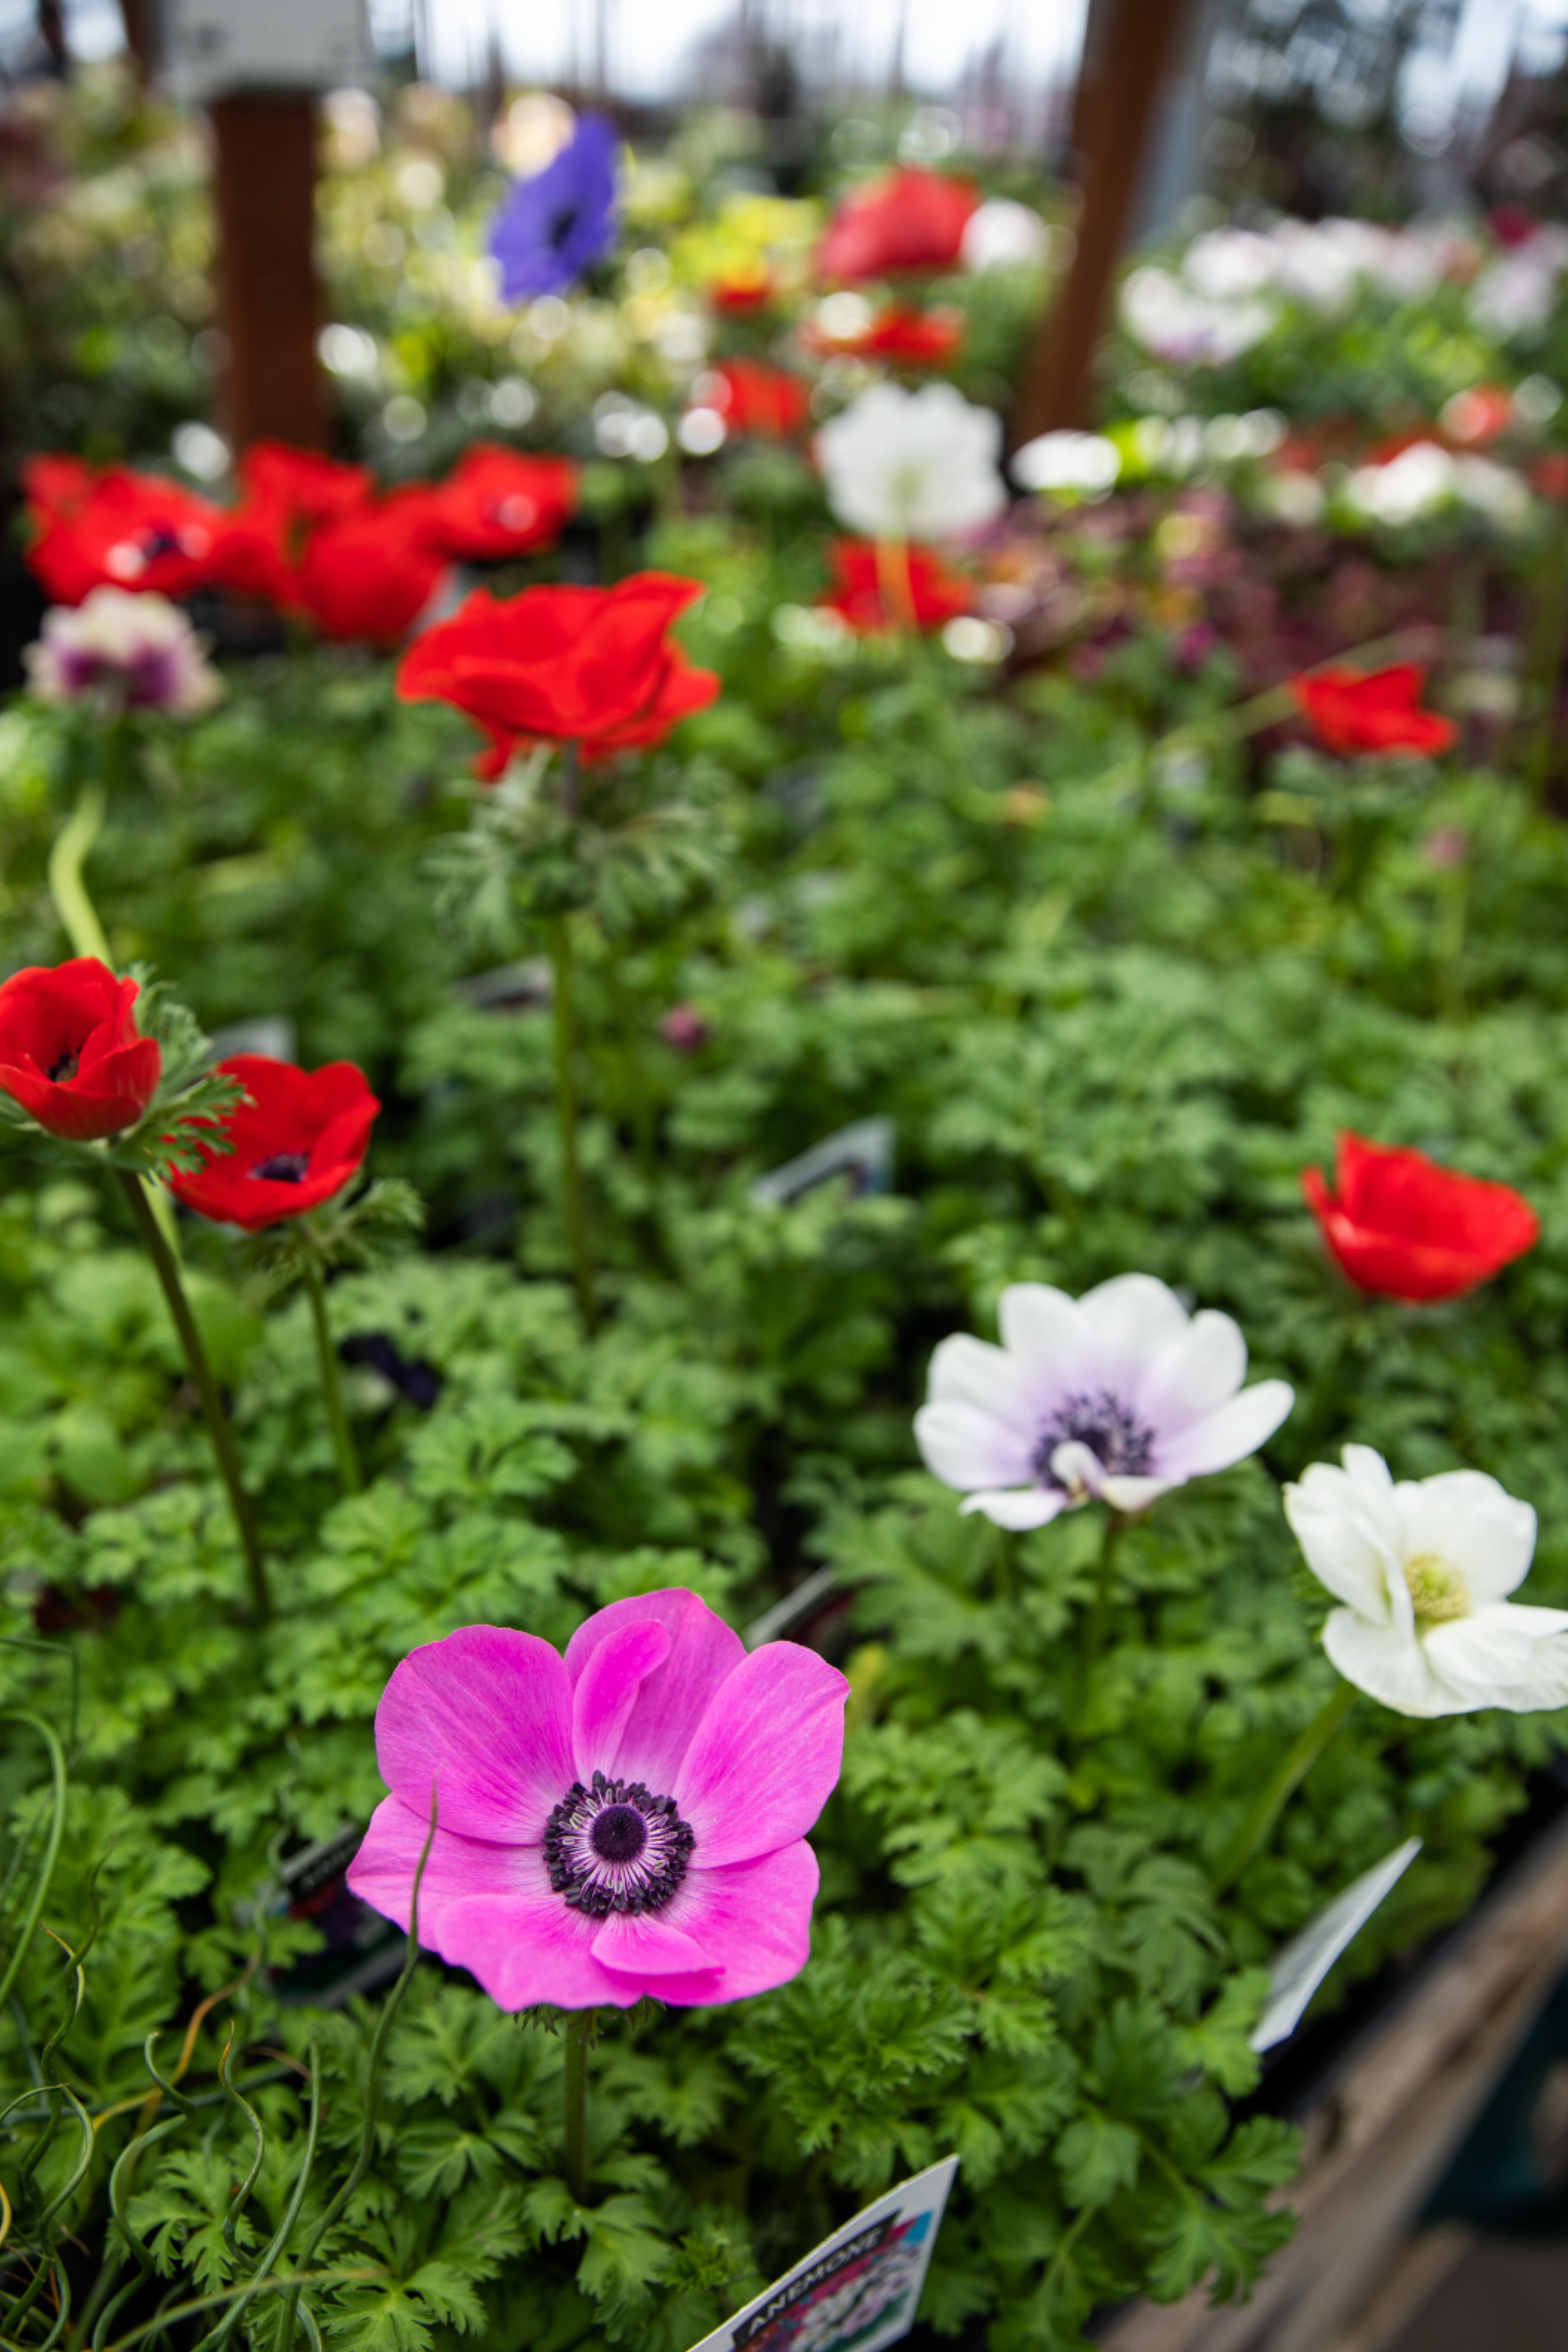 Anemone Coronaria In 2020 Poppy Flower Plants Alyssum